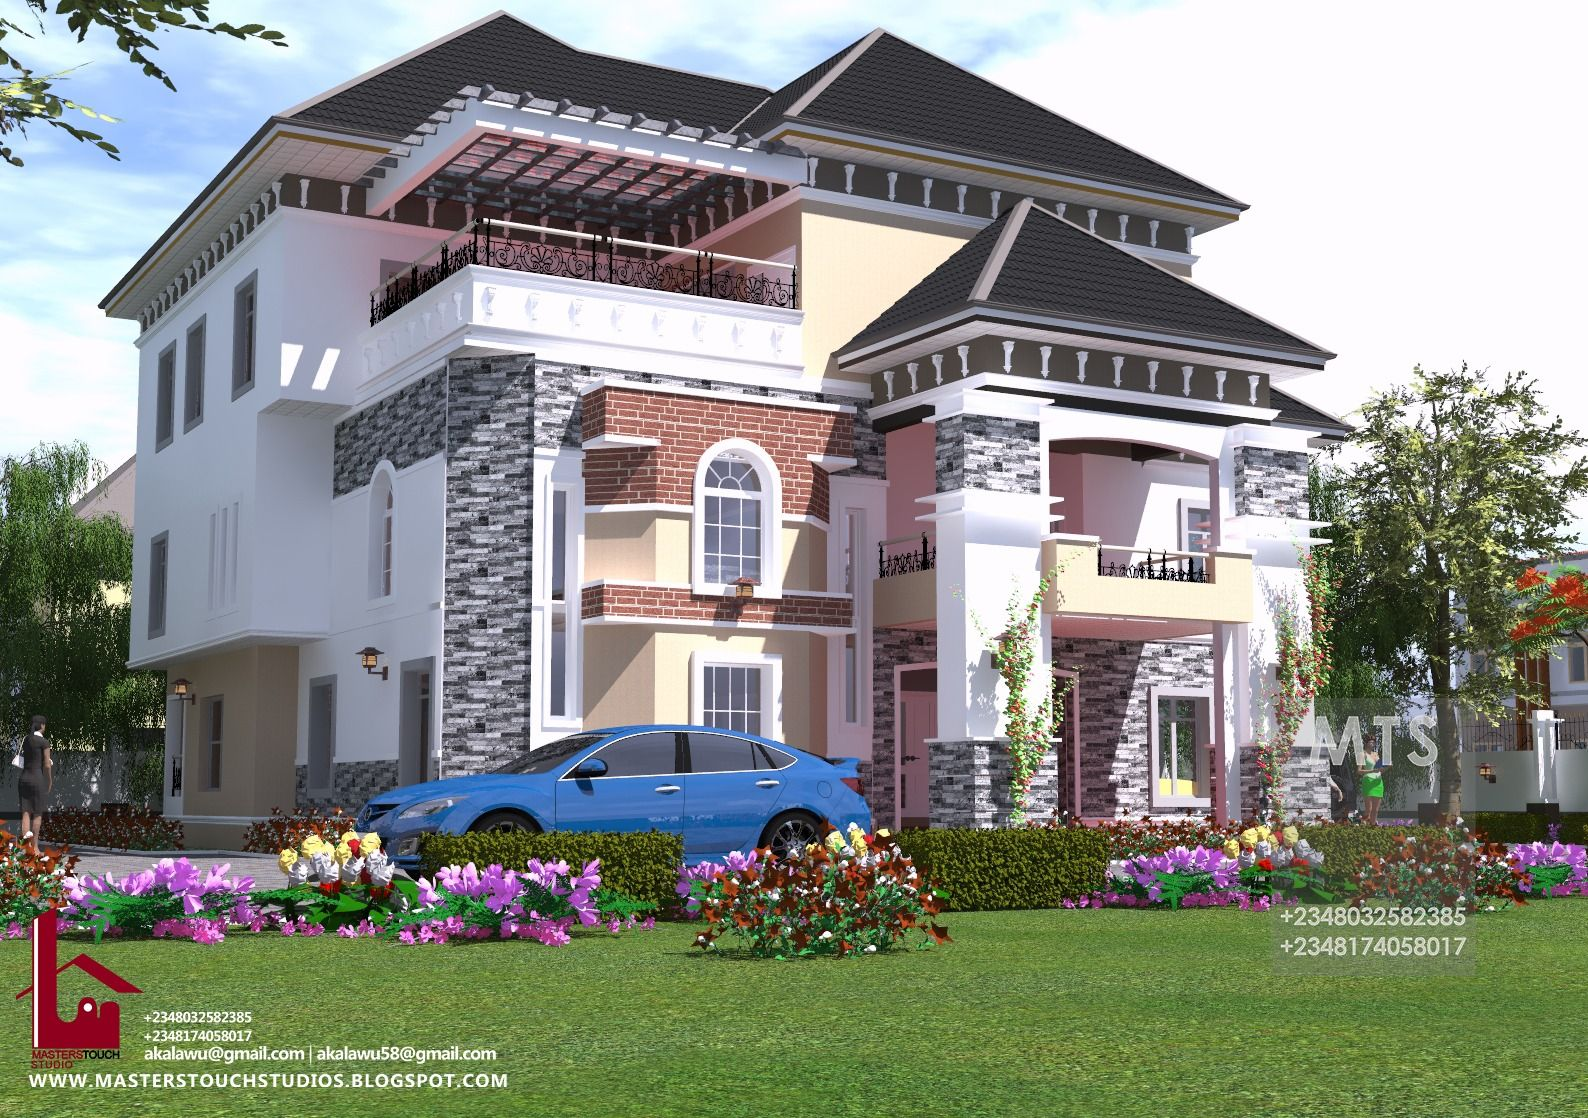 6 Bedroom Executive Duplex With Pent House Rf Ed6001 In 2020 Pent House 4 Bedroom House Designs Duplex House Design